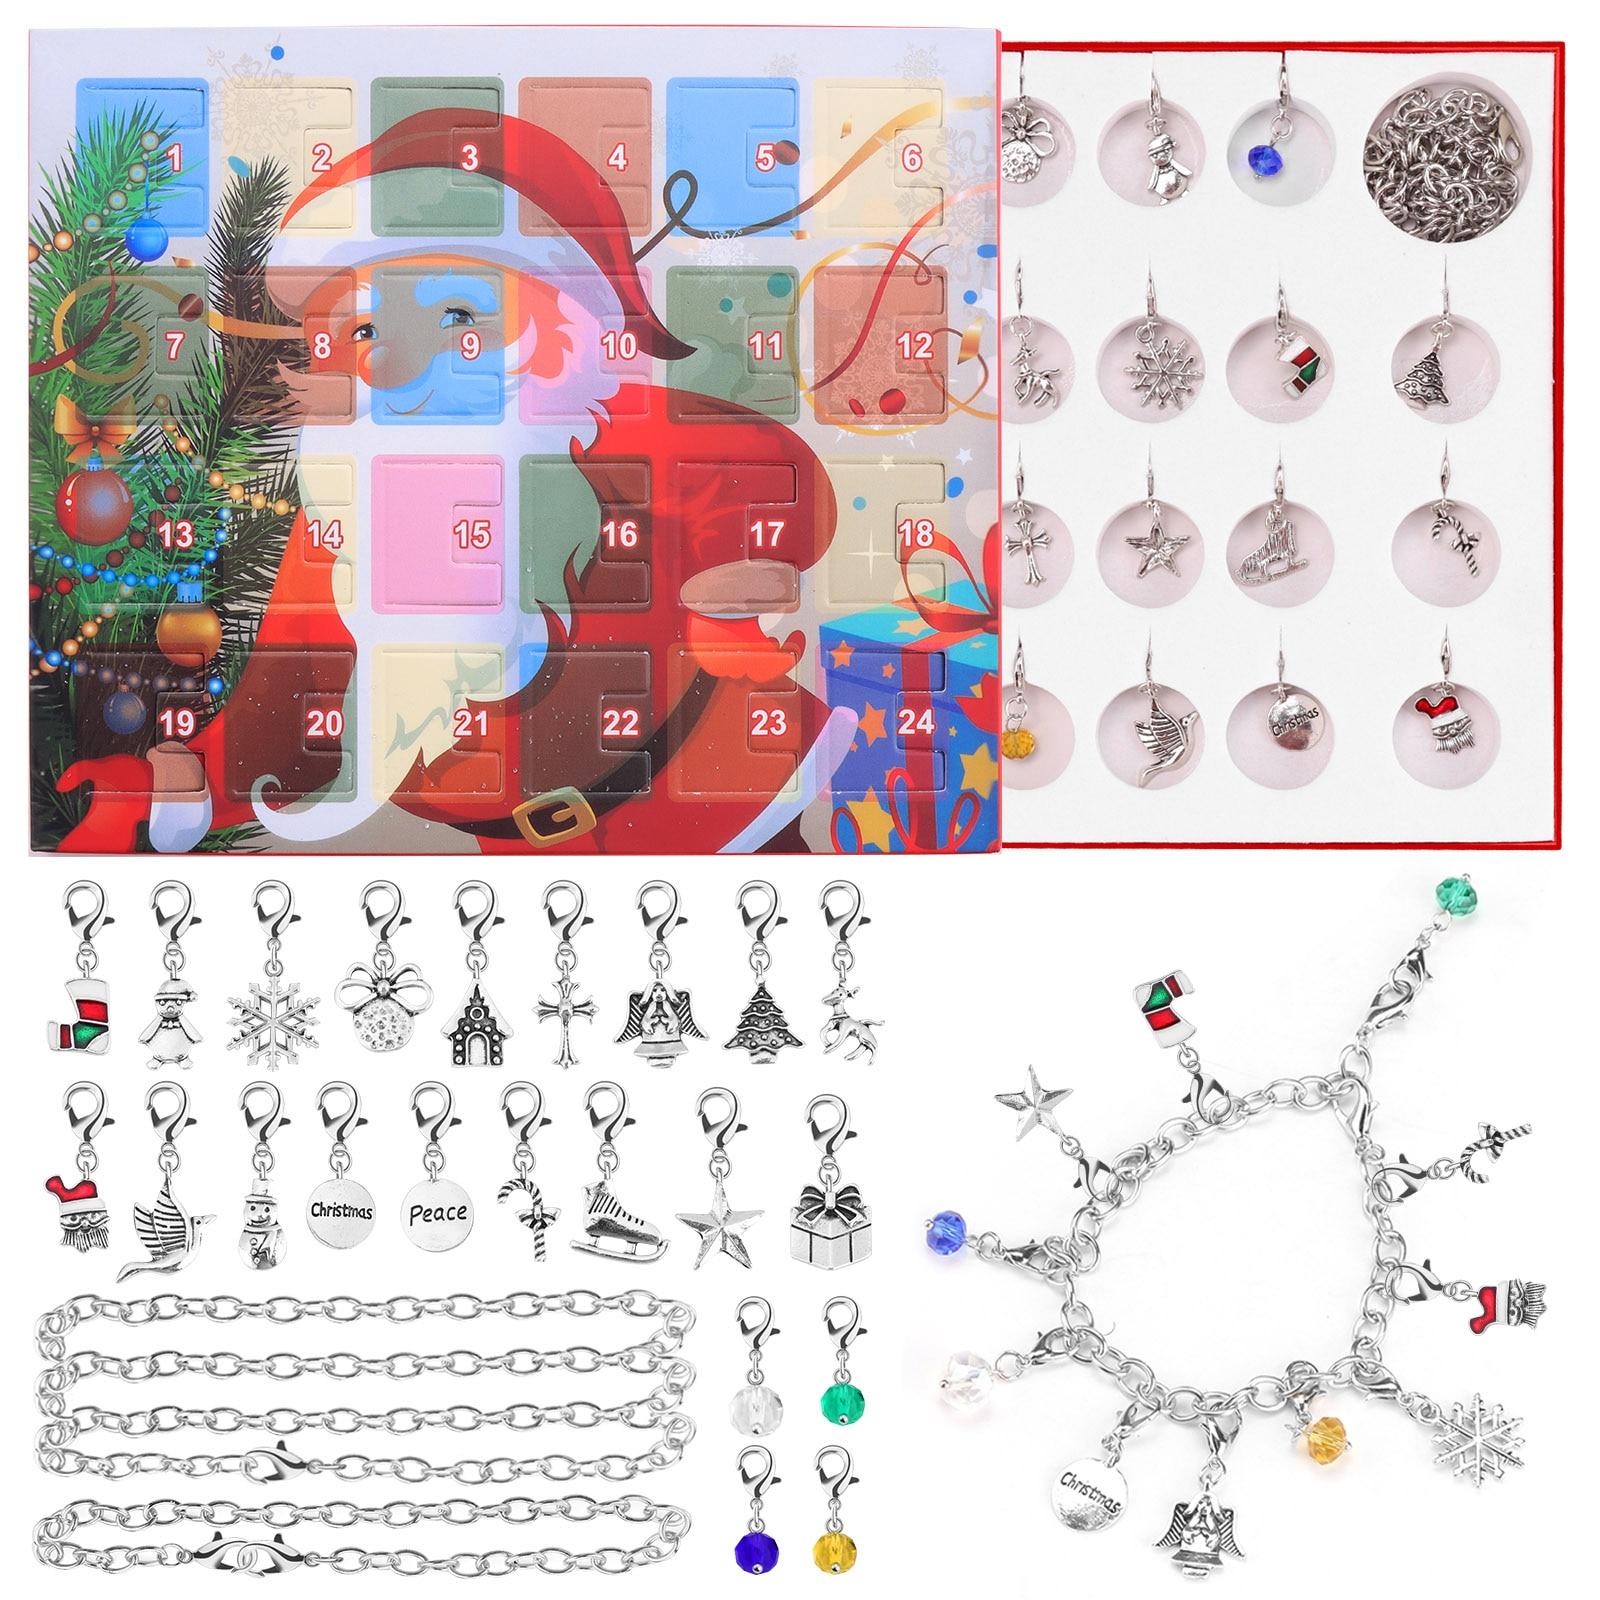 2020 24Days Christmas Countdown Advent Calendar DIY Charm Bracelet Necklace Jewelry Making Kit for Kids Children Xmas Gifts